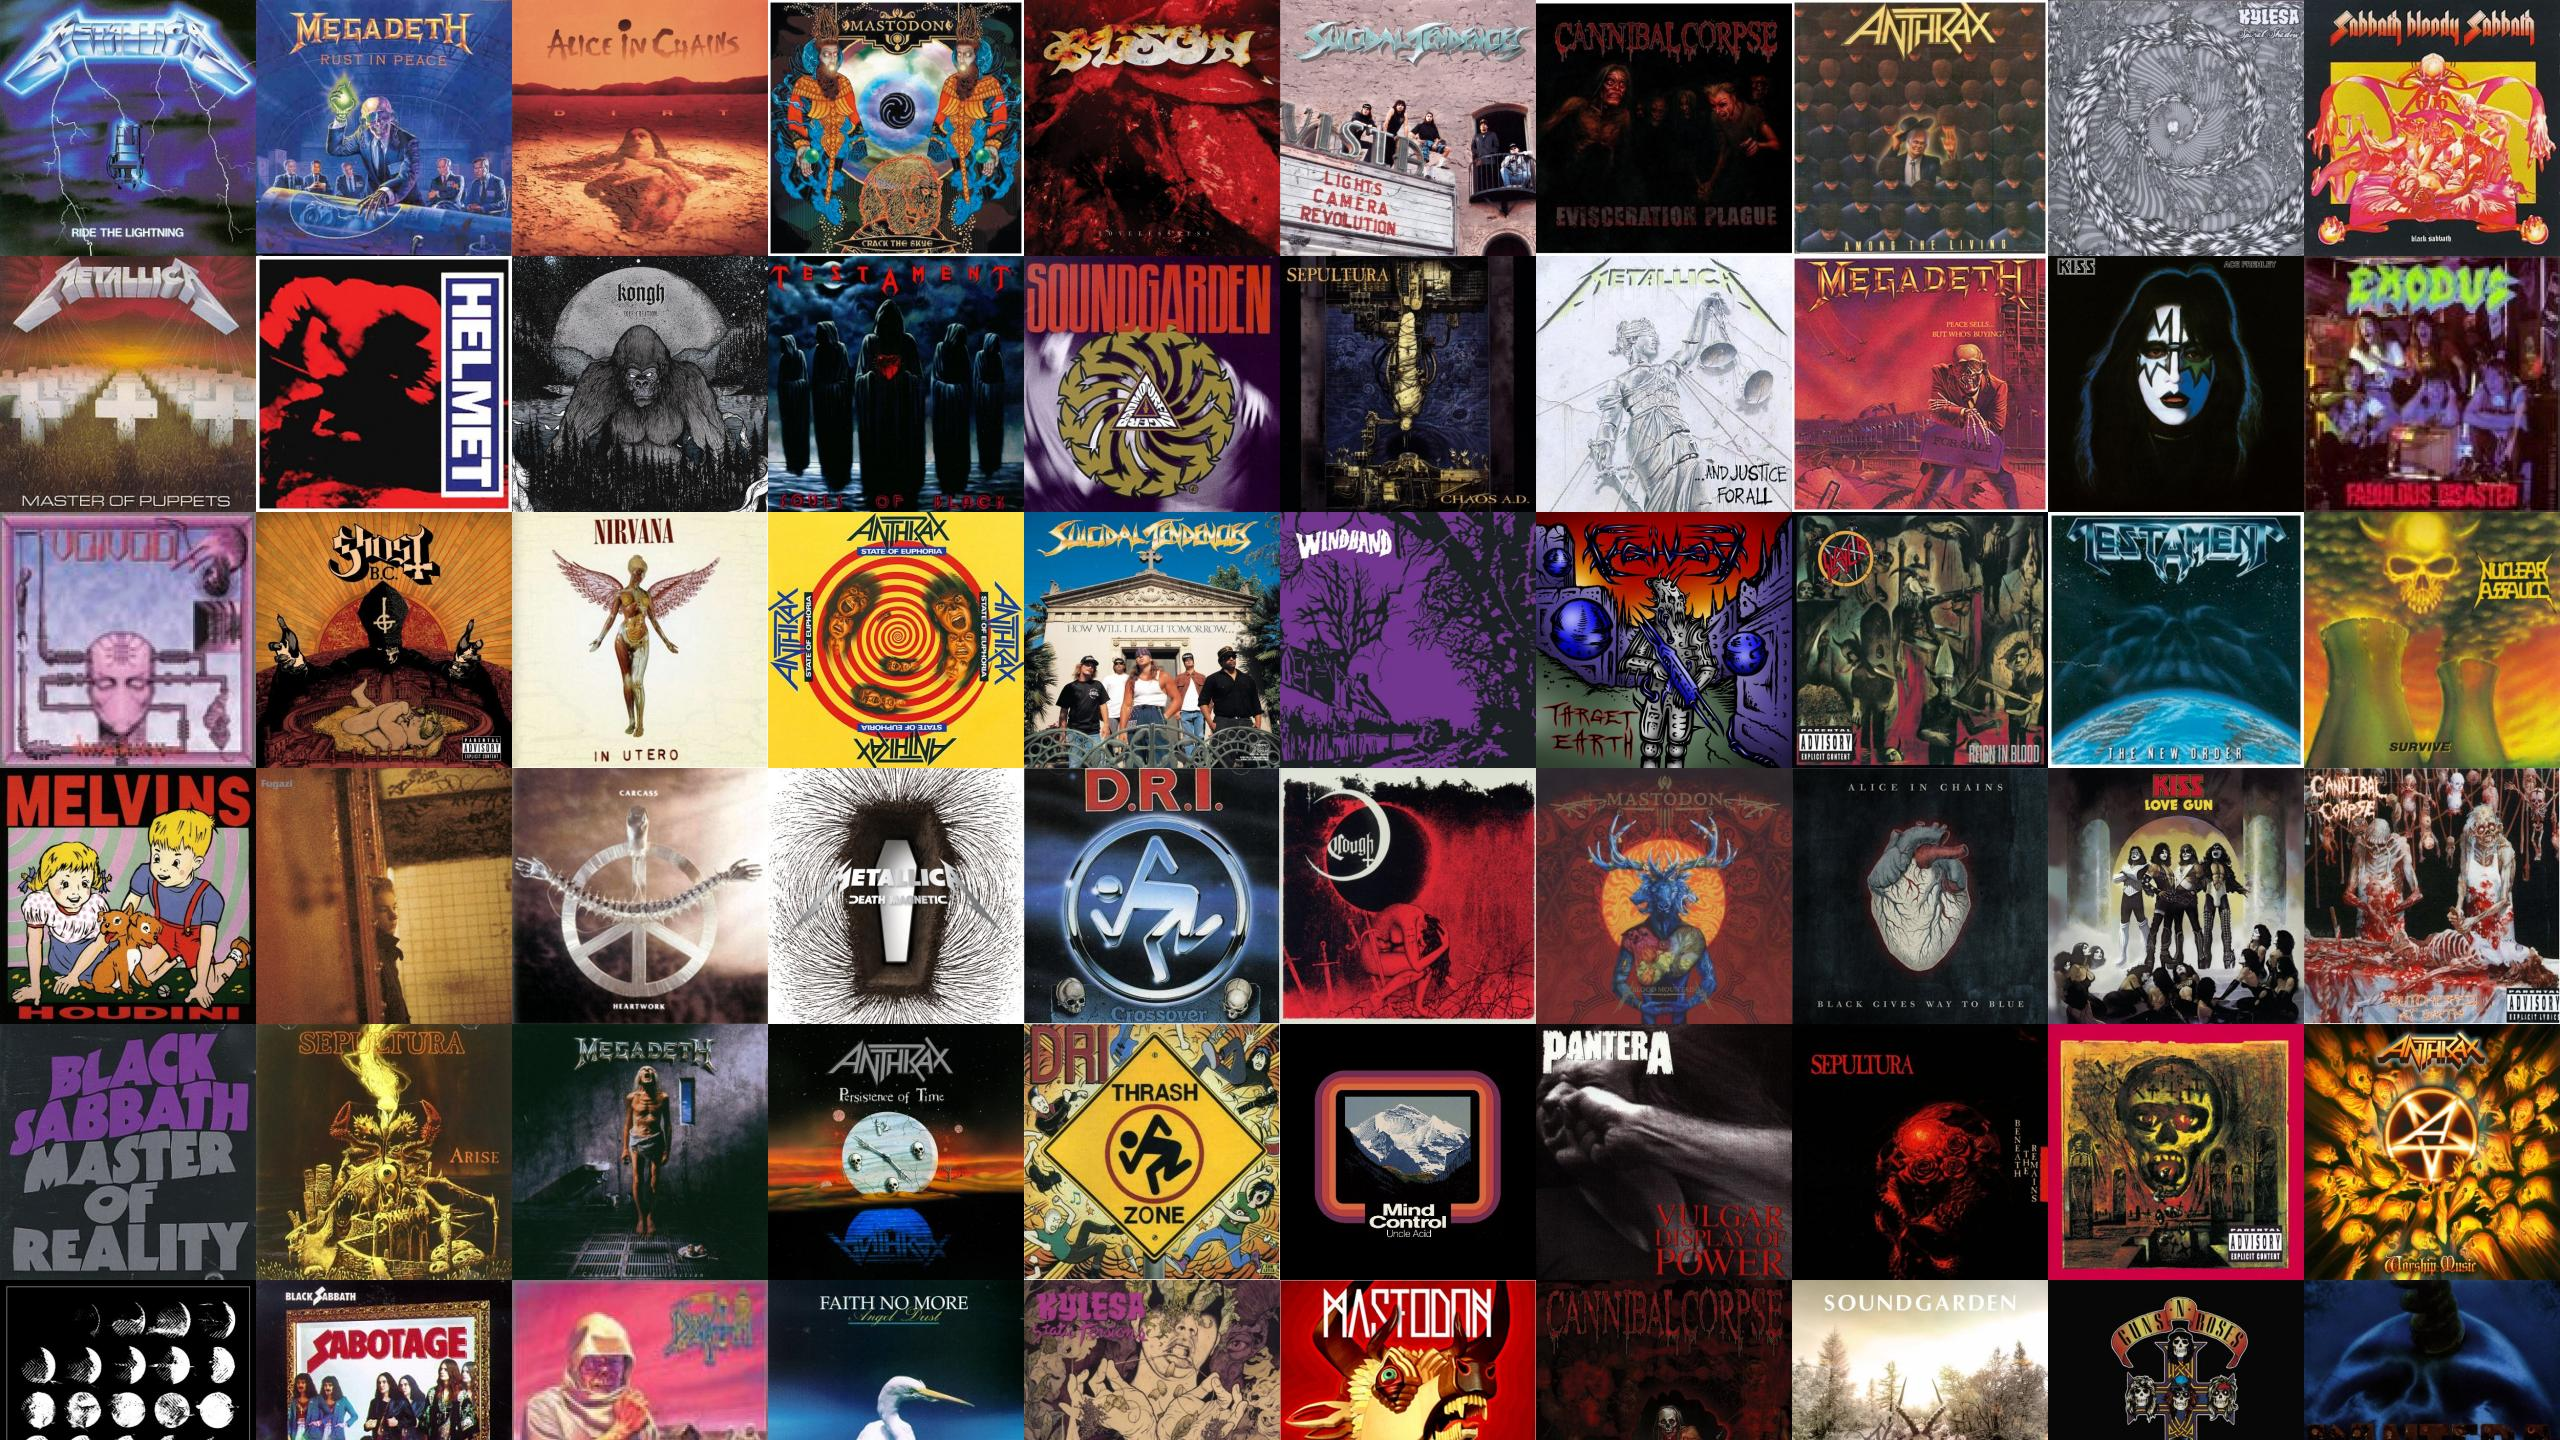 Metallica Ride Lightning Megadeth Rust In Peace Alice Wallpaper